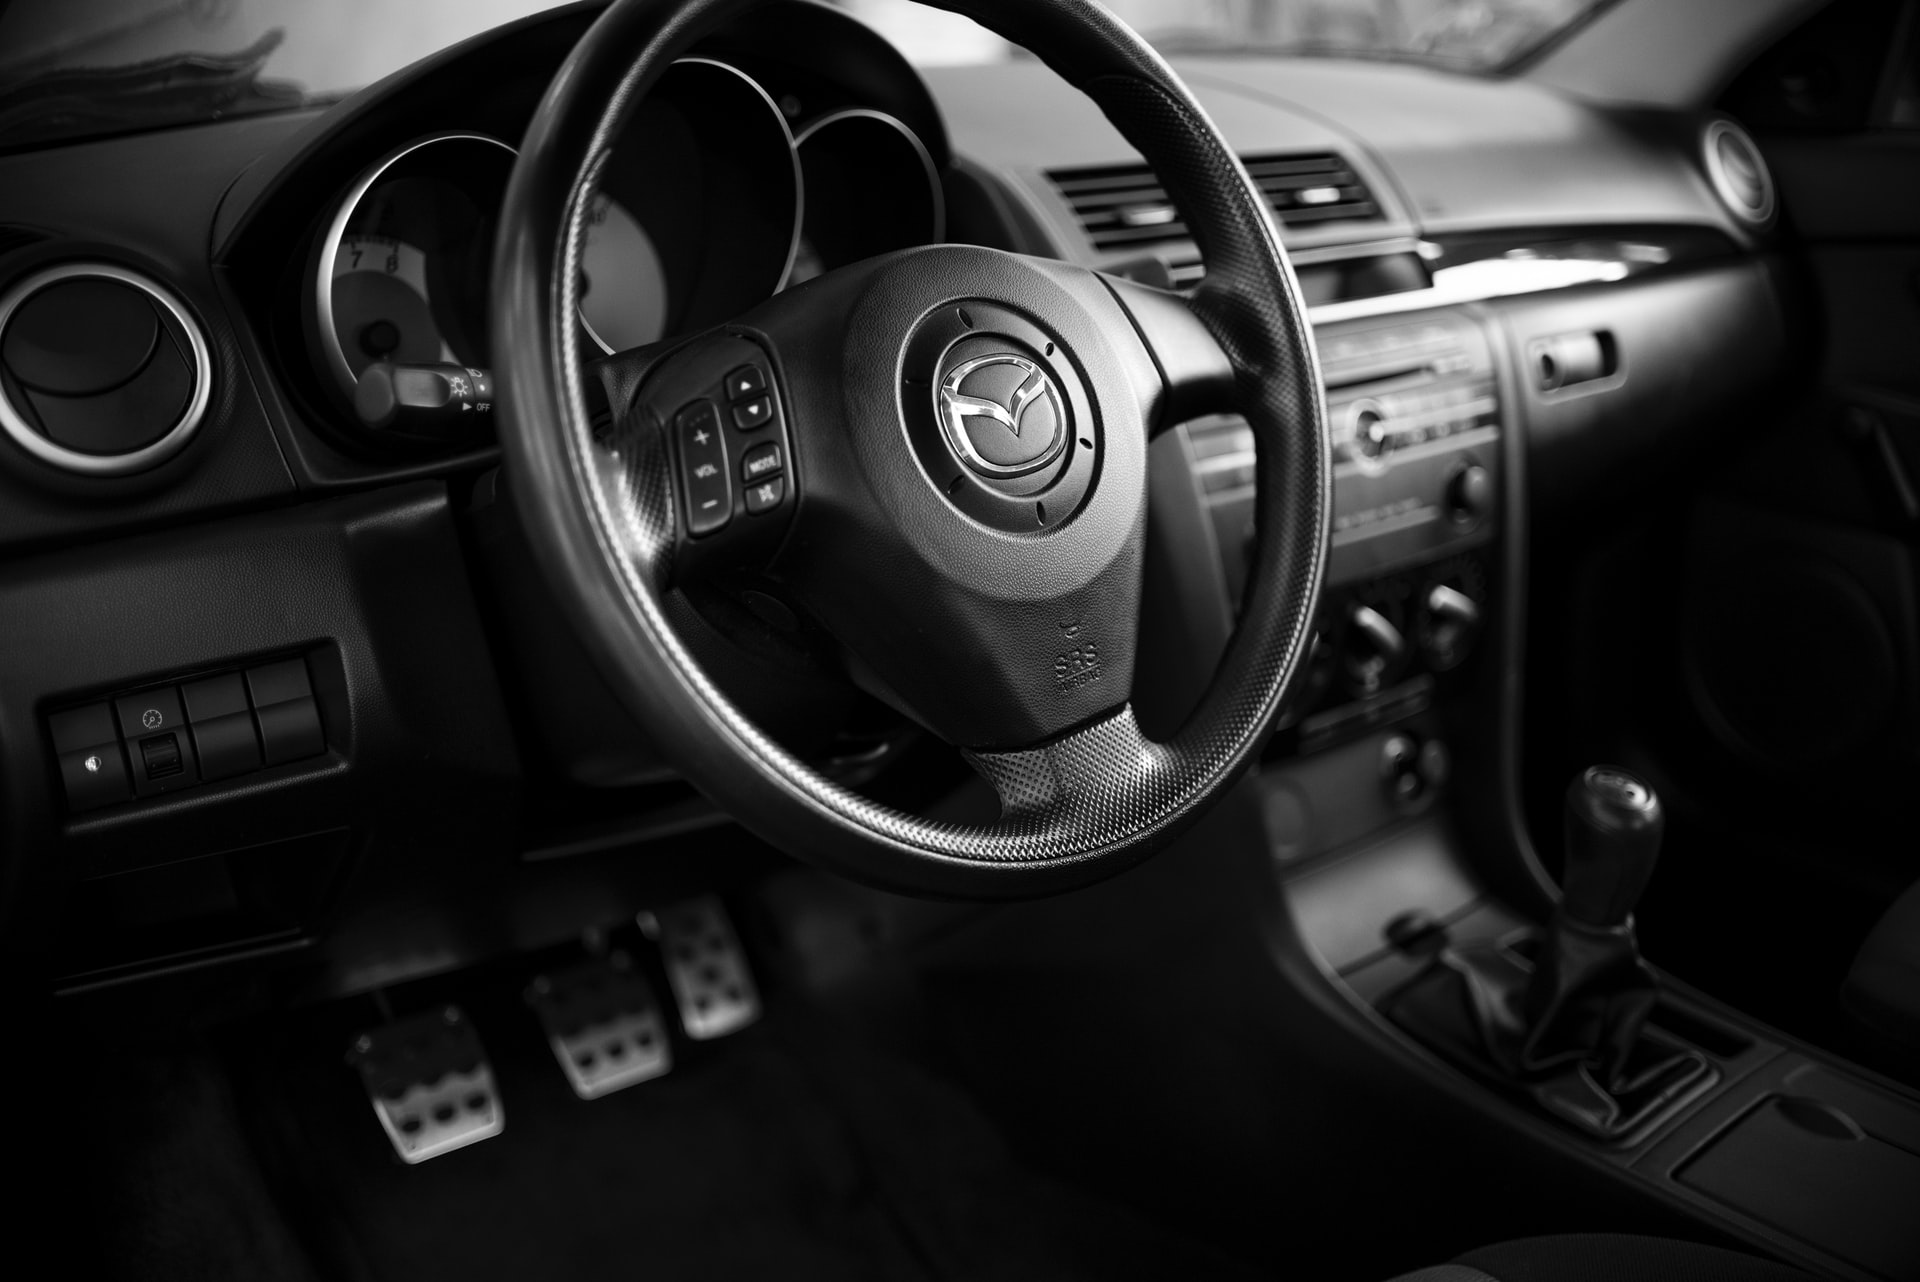 Mazda is Recalling Mazda3 Cars over a Steering-Wheel Logo